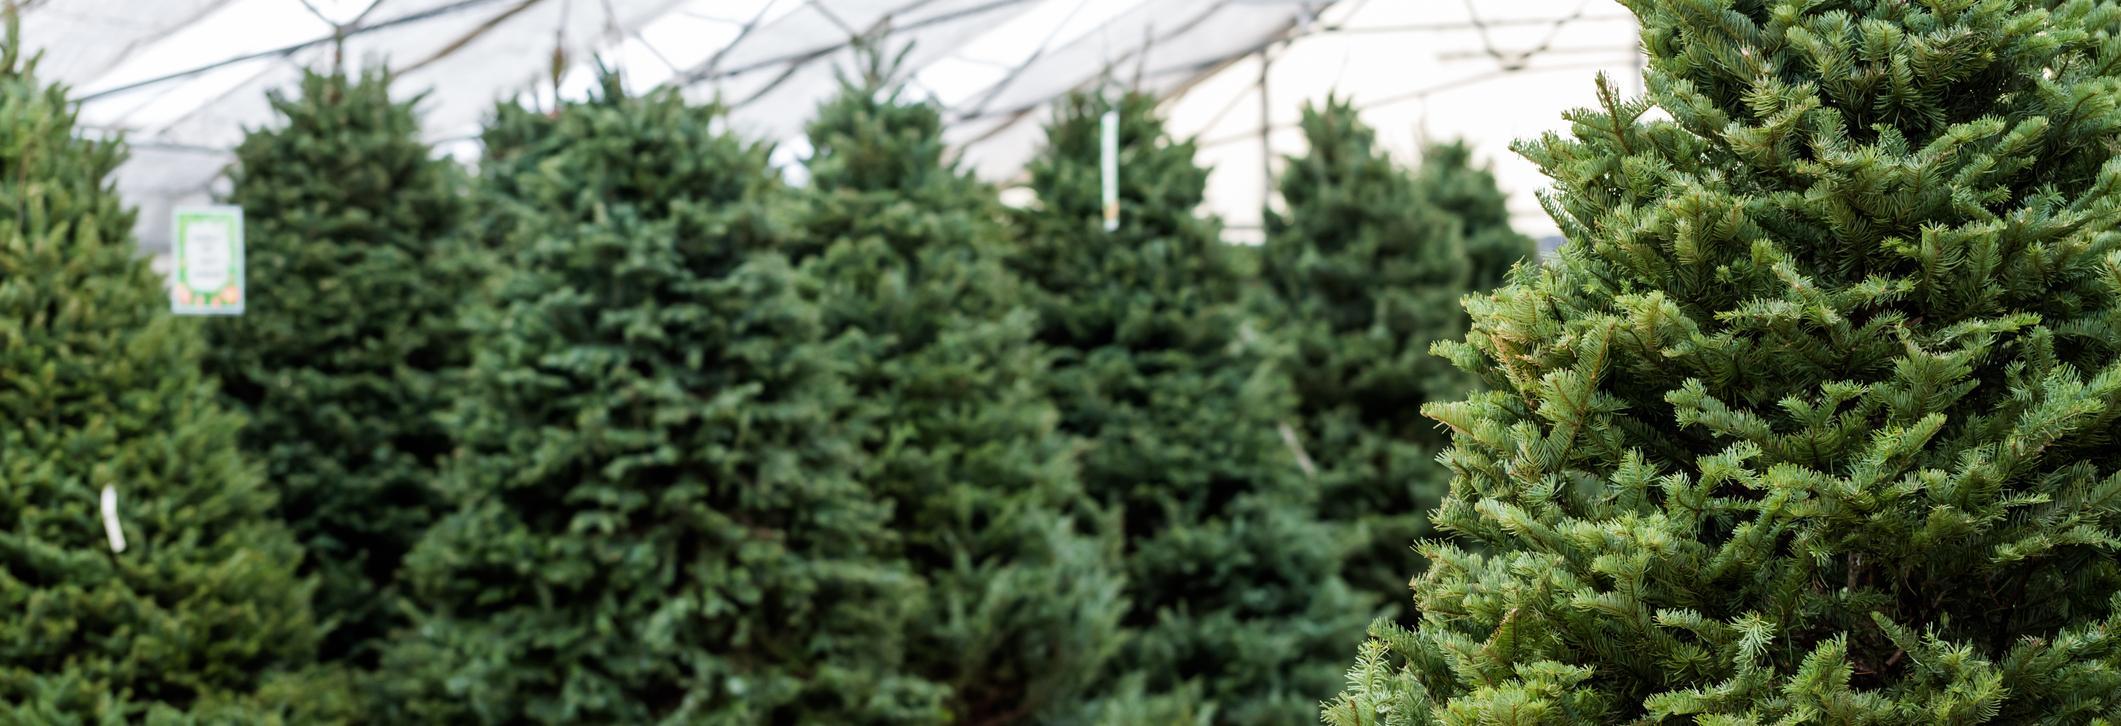 joe's pines ohio's largest selection of christmas trees dayton ohio